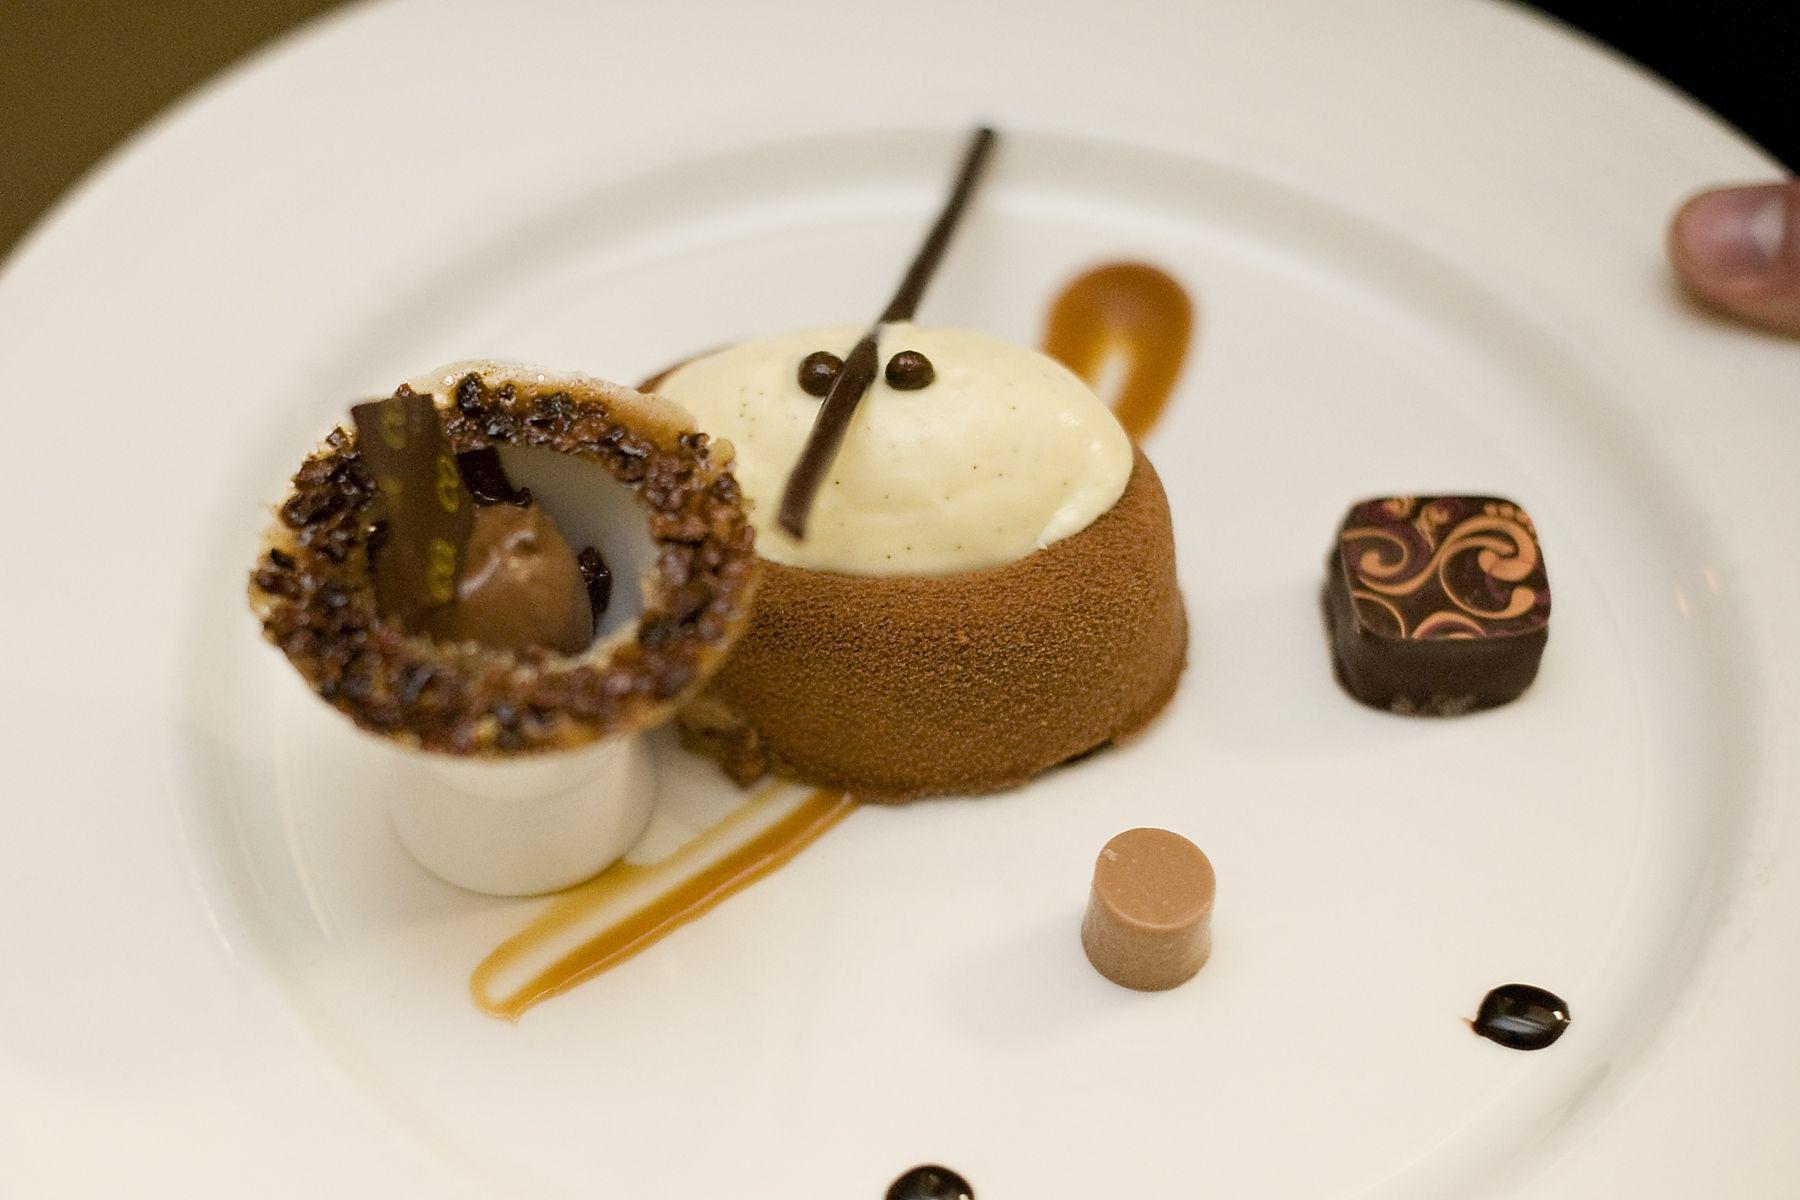 Pastry Chef Santosh Tiptur's Dark Chocolate Mousse, Vanilla Creme Brulee, Salted Caramel, Crunchy Chocolate Pearls, Dark Chocolate Sorbet and Cinnamon Toffee Bon Bon at the 2012 Hospitality Gala